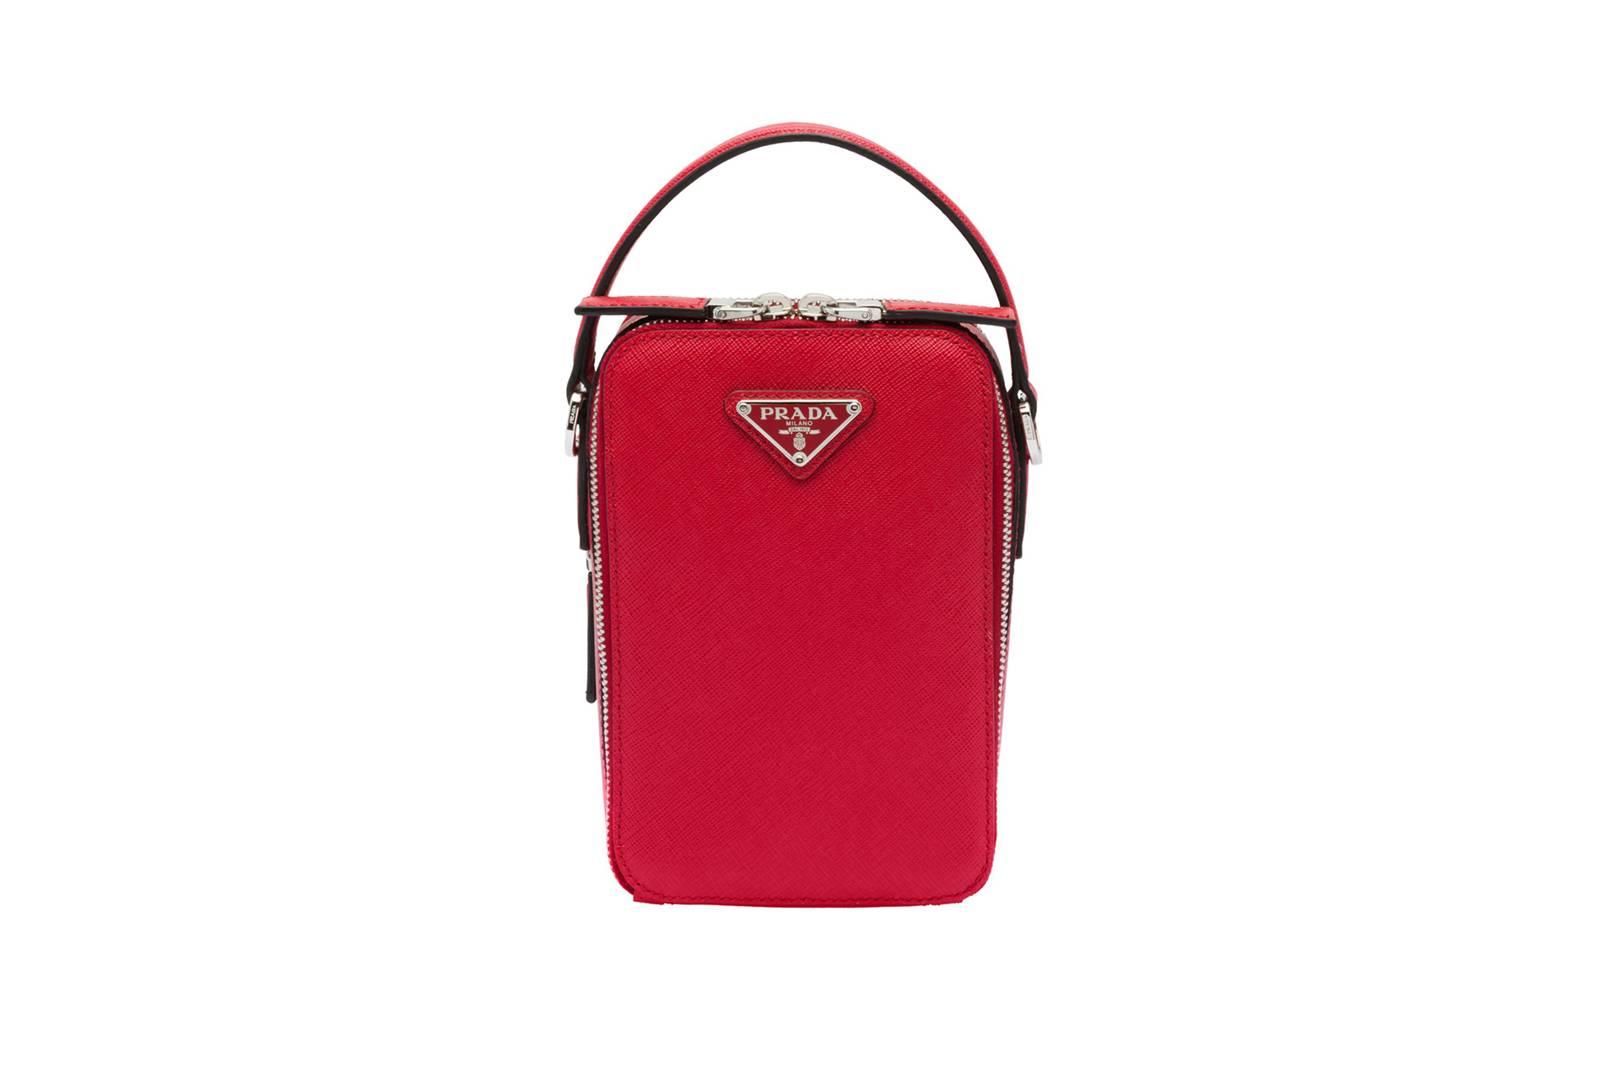 8a42e2c36570 Make like Anwar Hadid and invest in a handbag